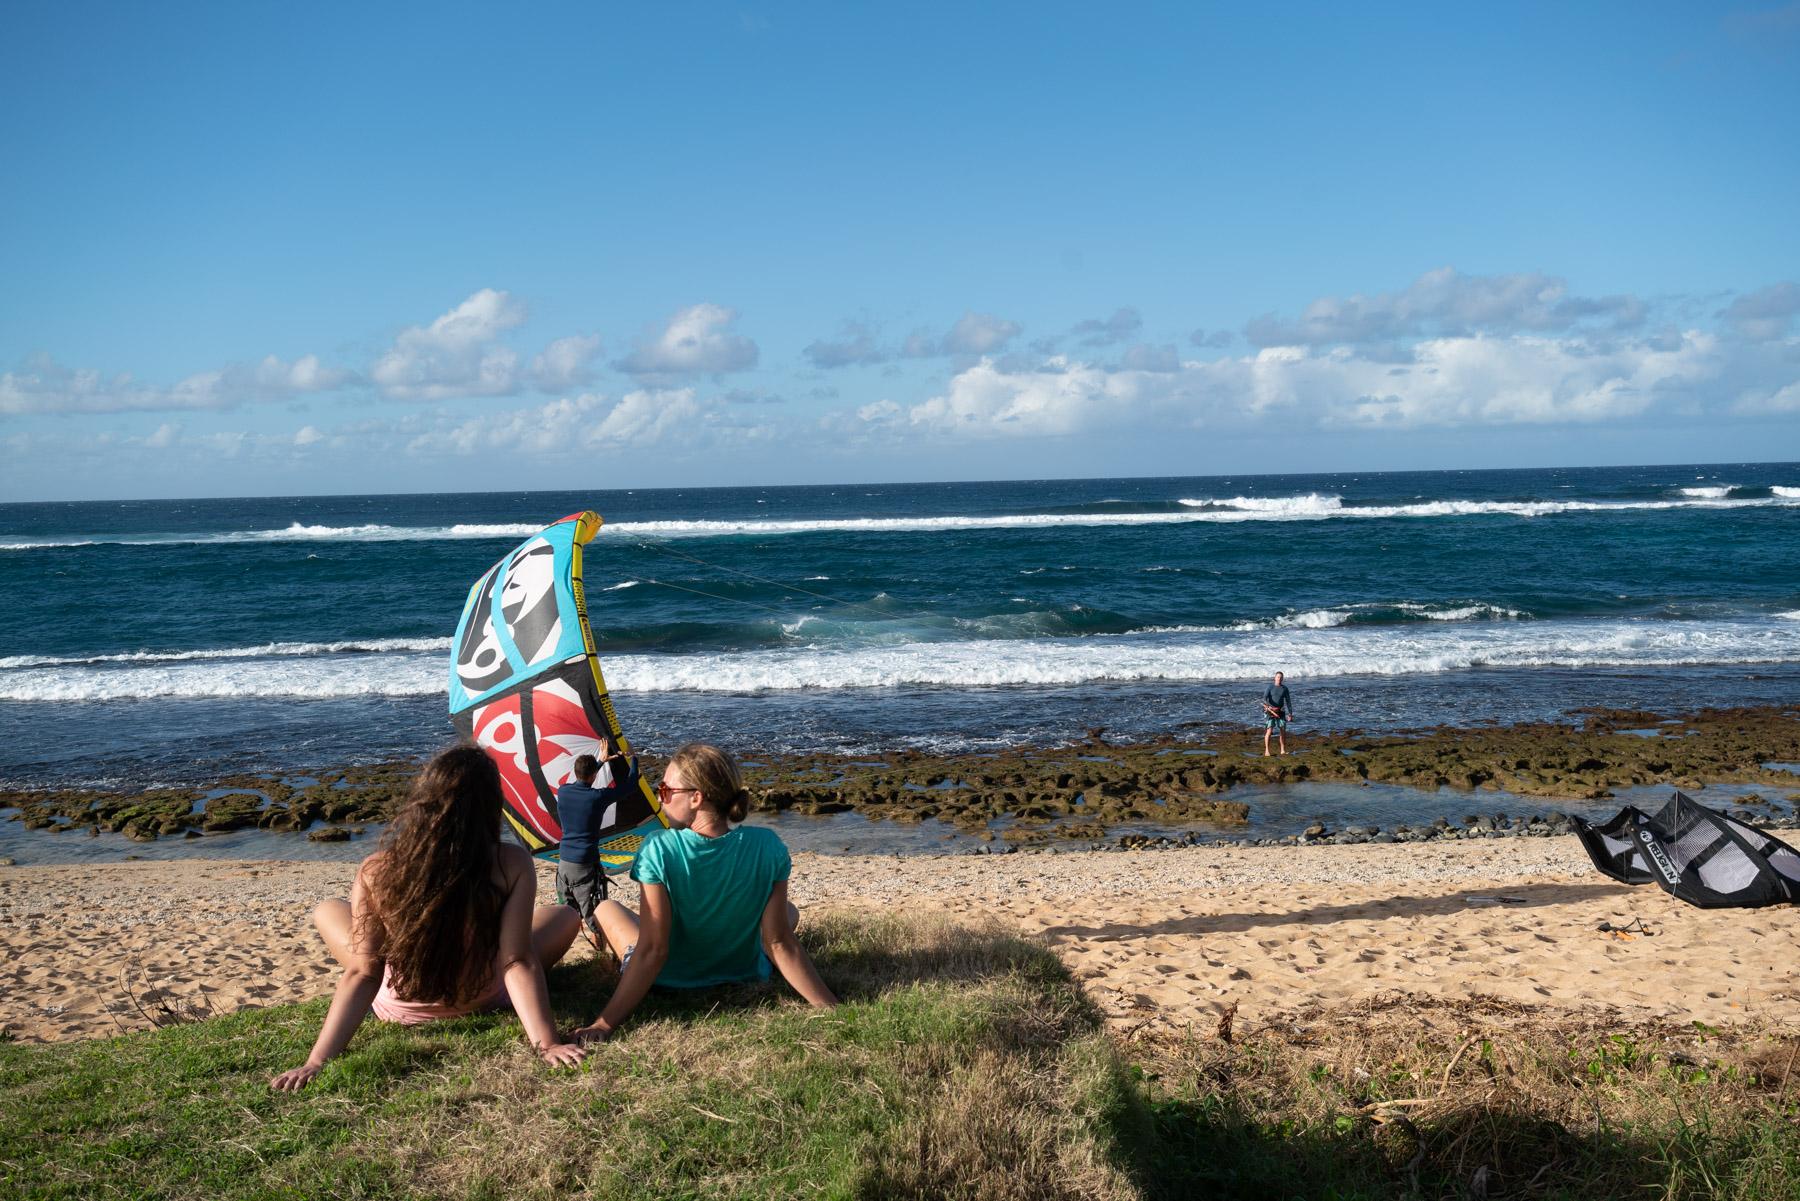 Maui-Trip-Kite-13.jpg